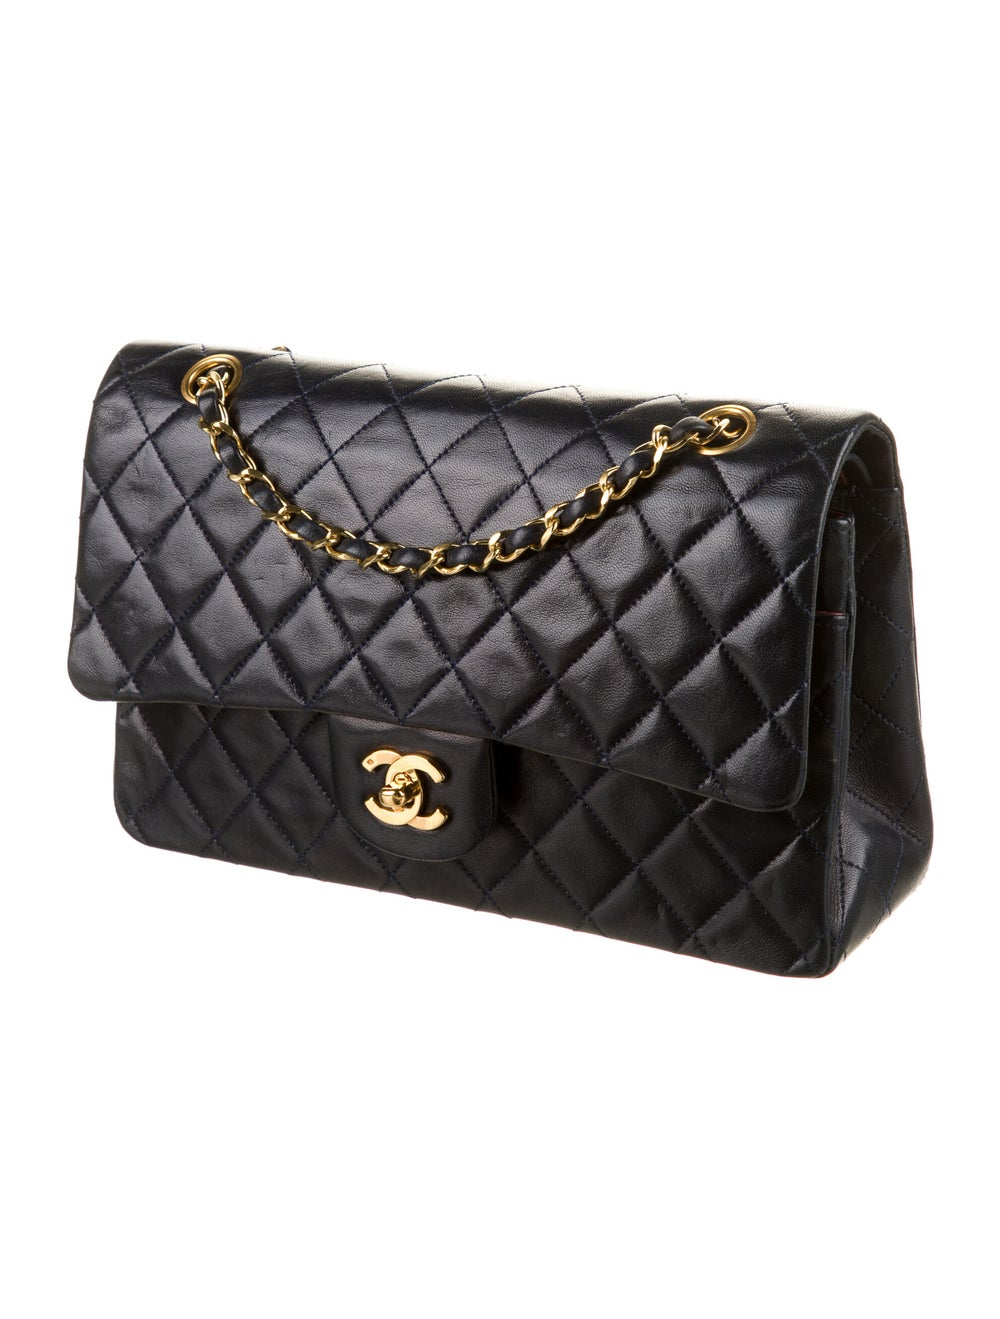 Chanel Classic Medium Double Flap Bag Blue - image 3